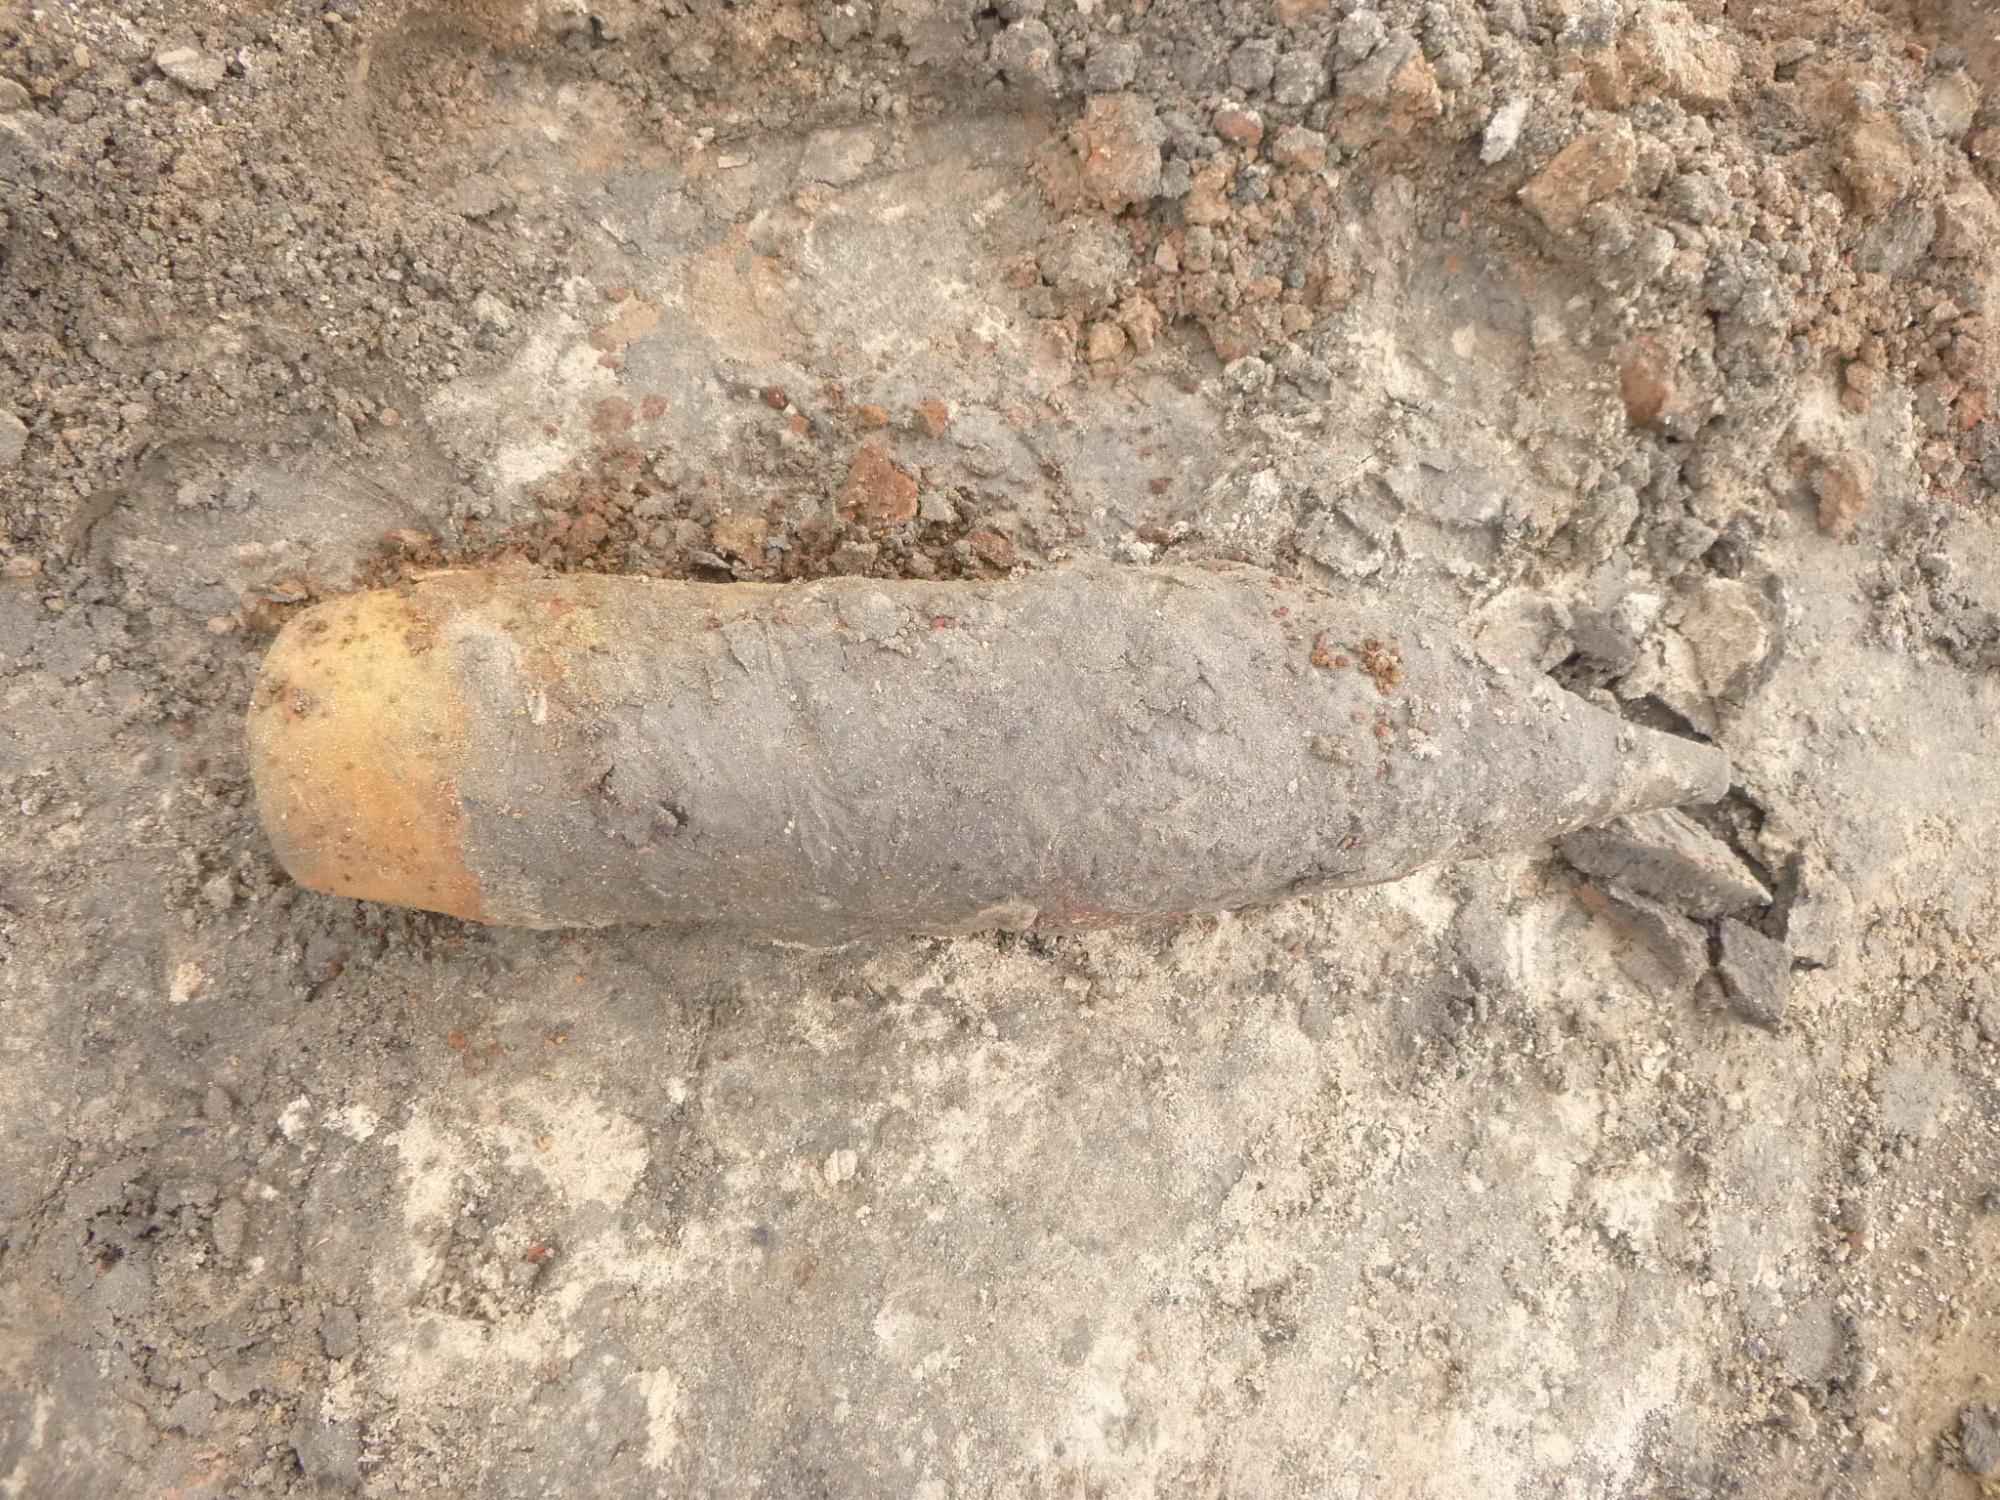 Артиллерийский снаряд и миномётную мину обезвредили в Твери